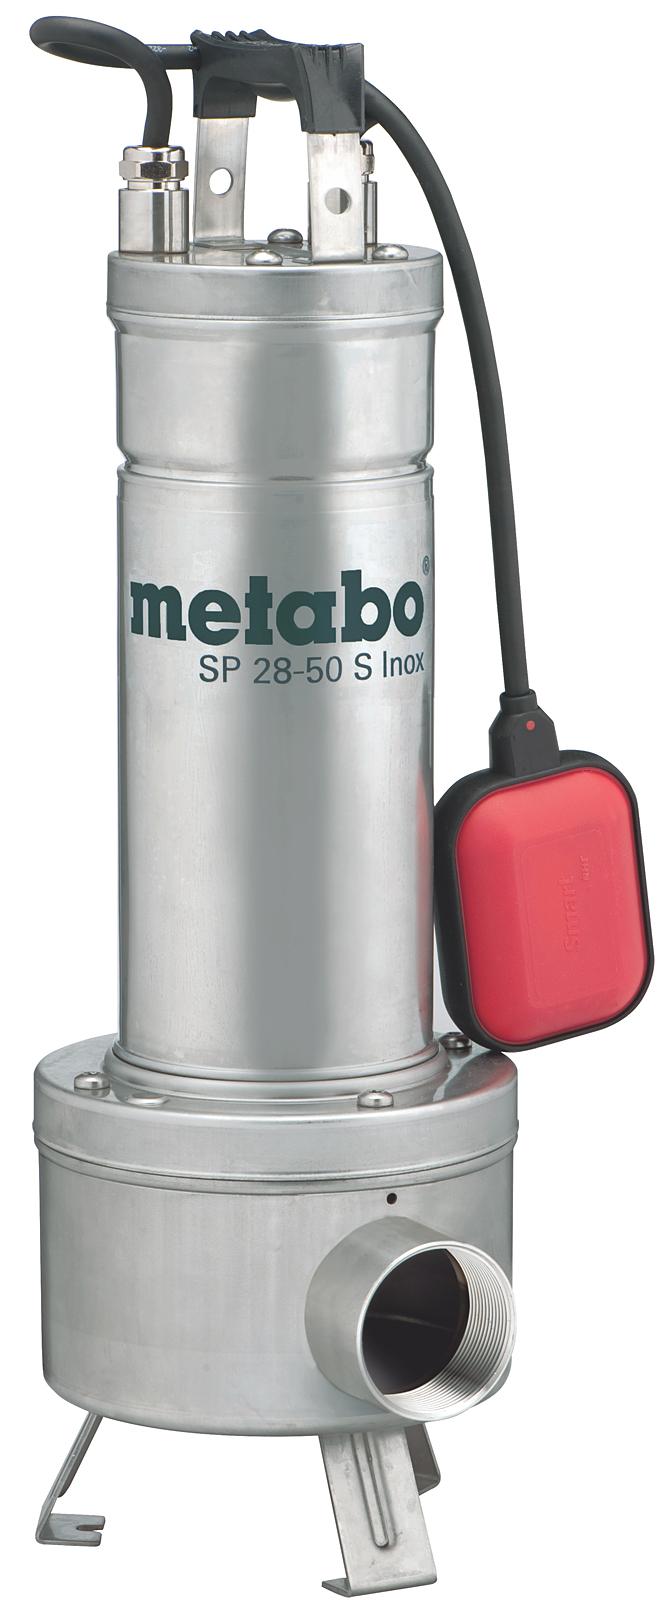 Дренажный насос Metabo Sp 28-50 s inox (604114000) насос погружной metabo sp 28 50 s inox